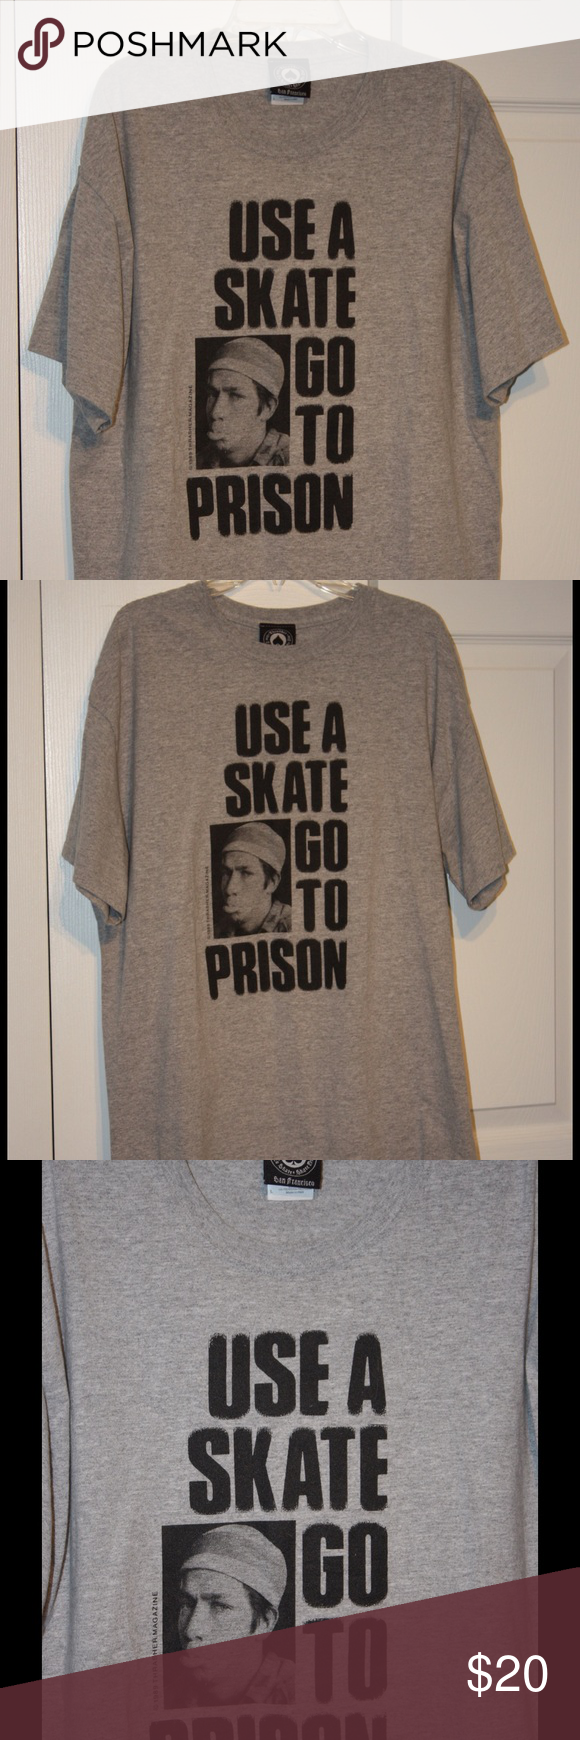 Men's skate tee. Thrasher brand men's short sleeve tee shirt. Use a skate, go to jail picture on front. Thrasher Shirts Tees - Short Sleeve